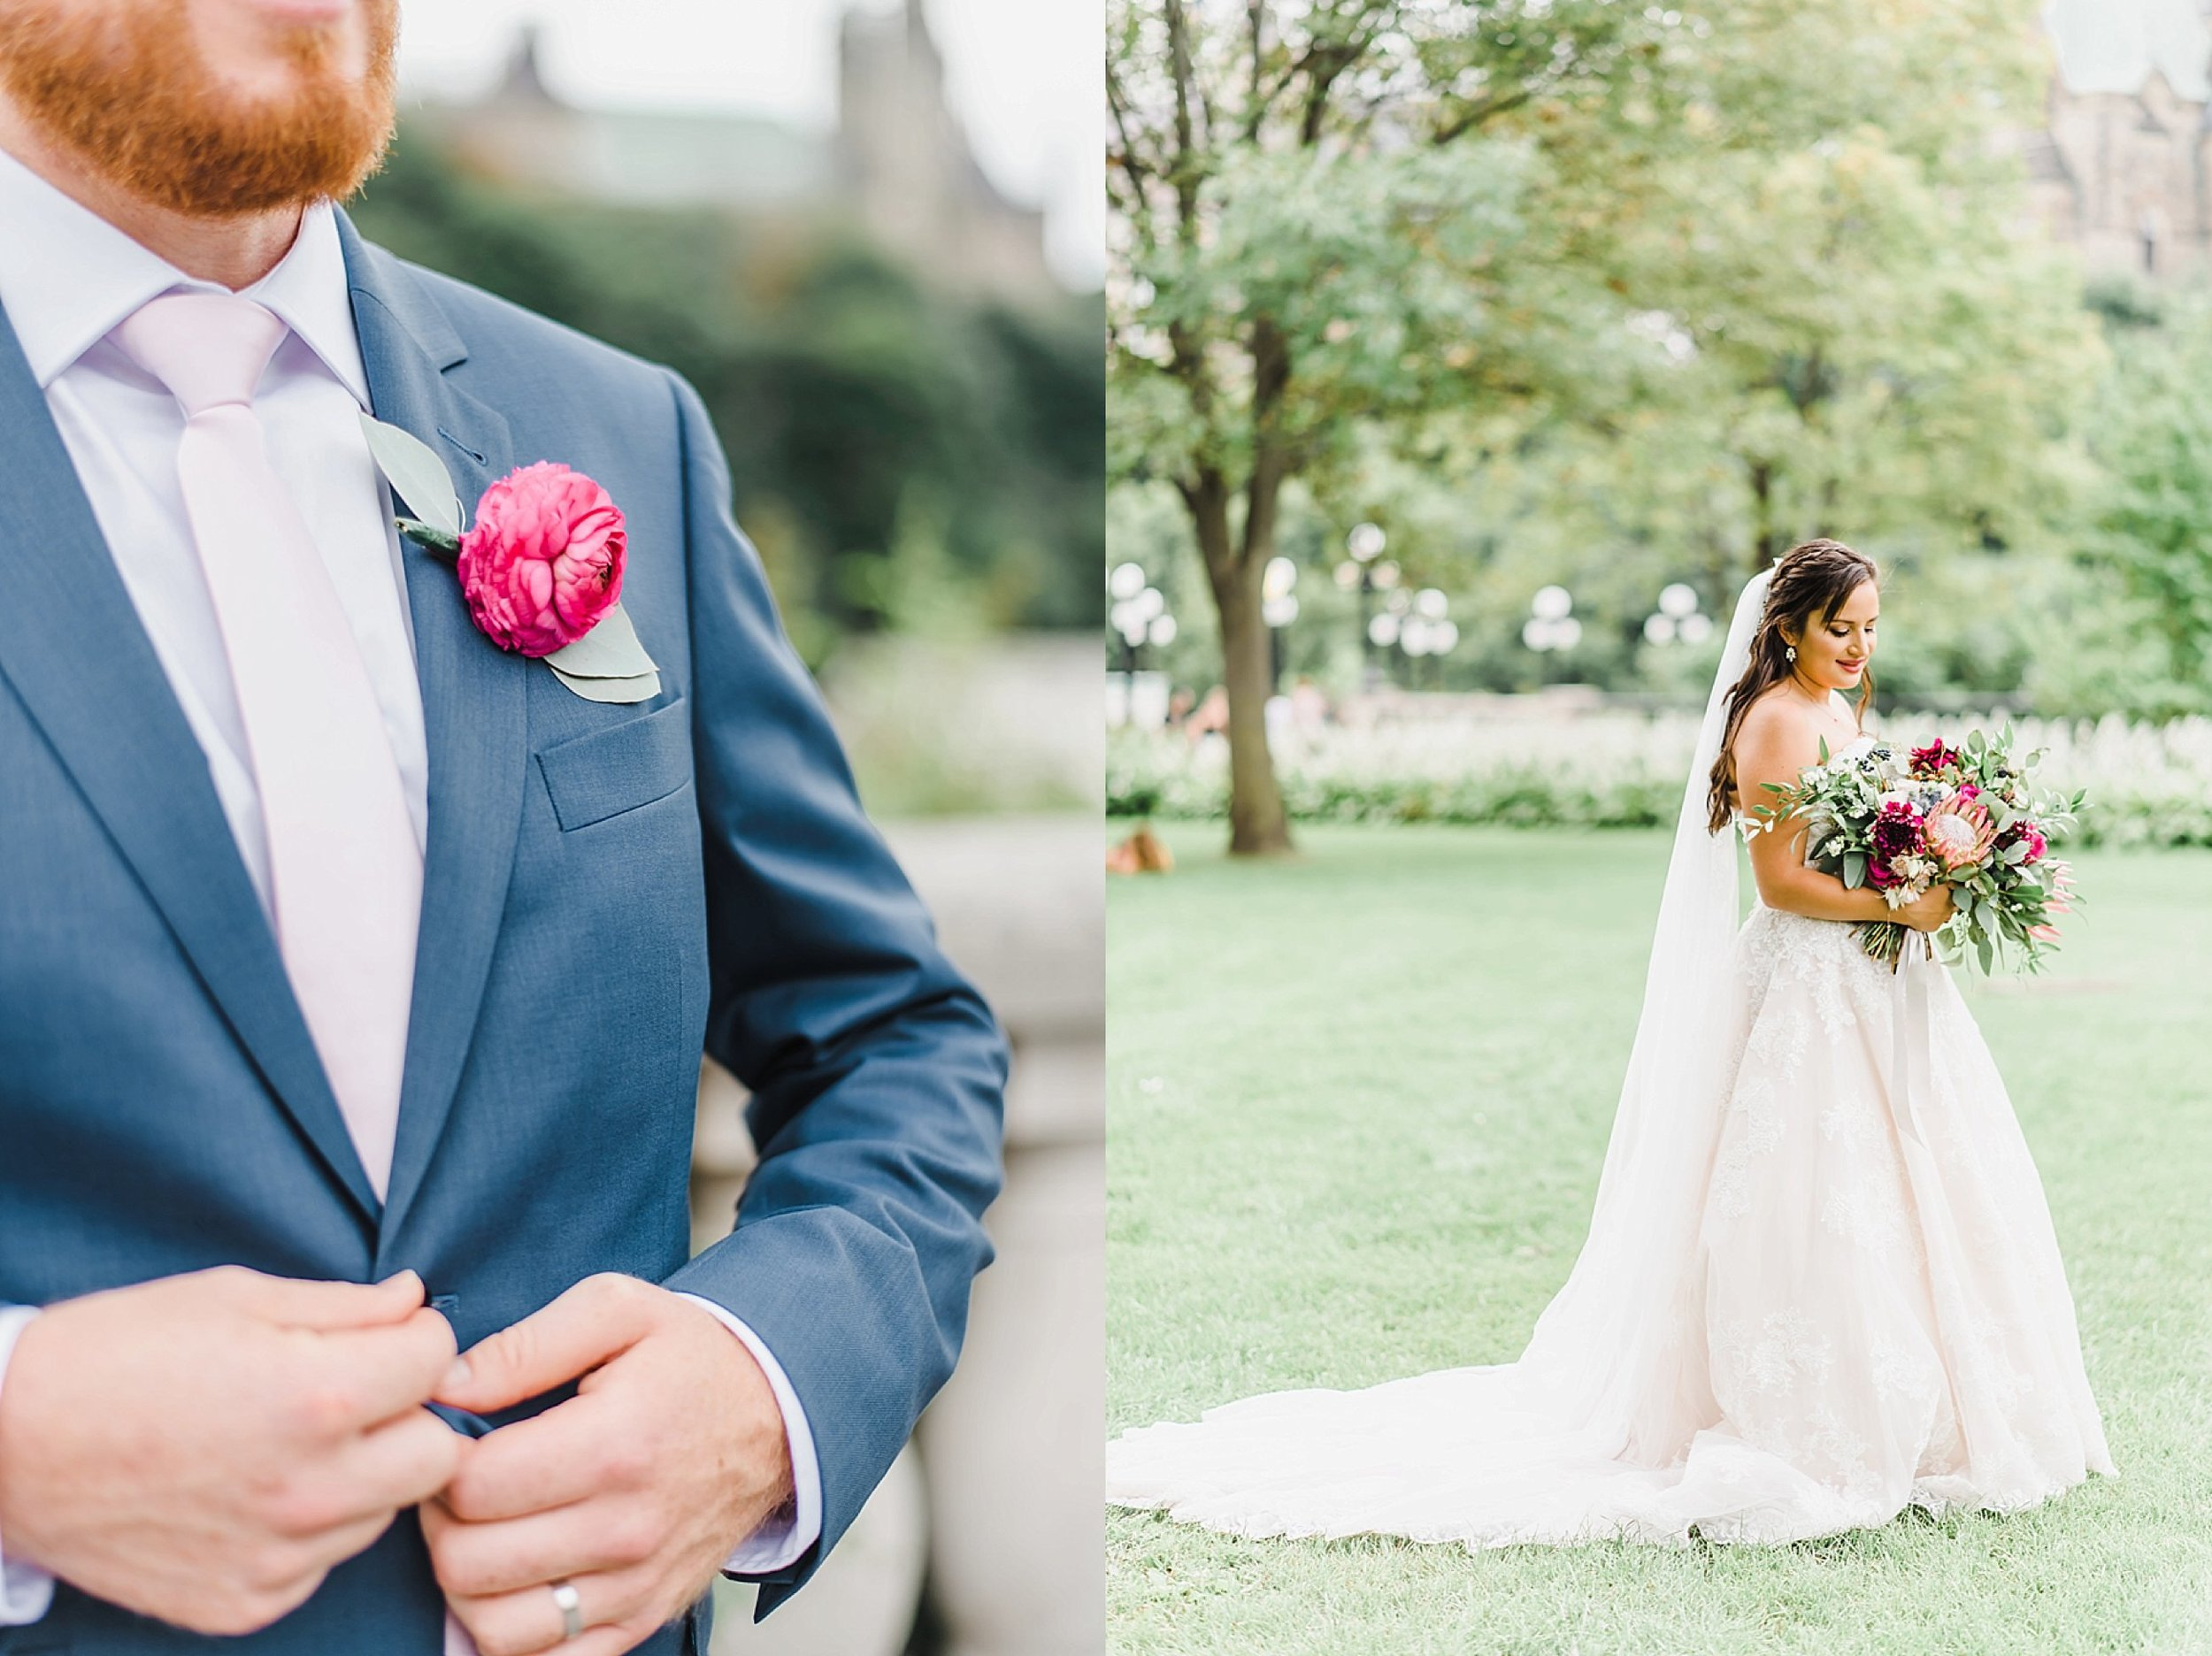 light airy indie fine art ottawa wedding photographer | Ali and Batoul Photography_1633.jpg